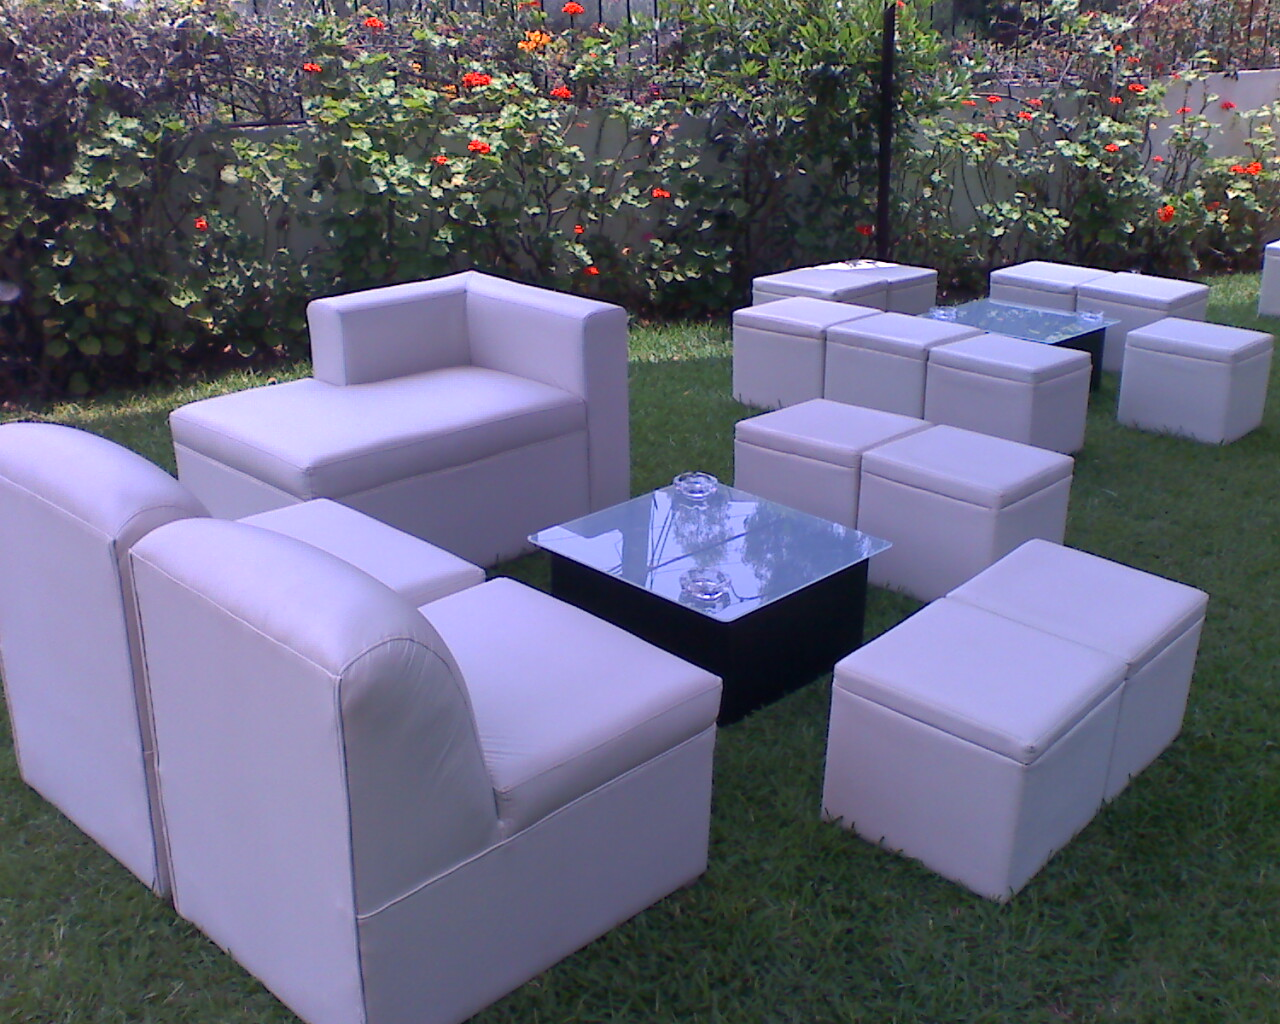 De Gala - Lounge Bar: Alquiler Muebles Lounge, Mobiliario Lounge ...